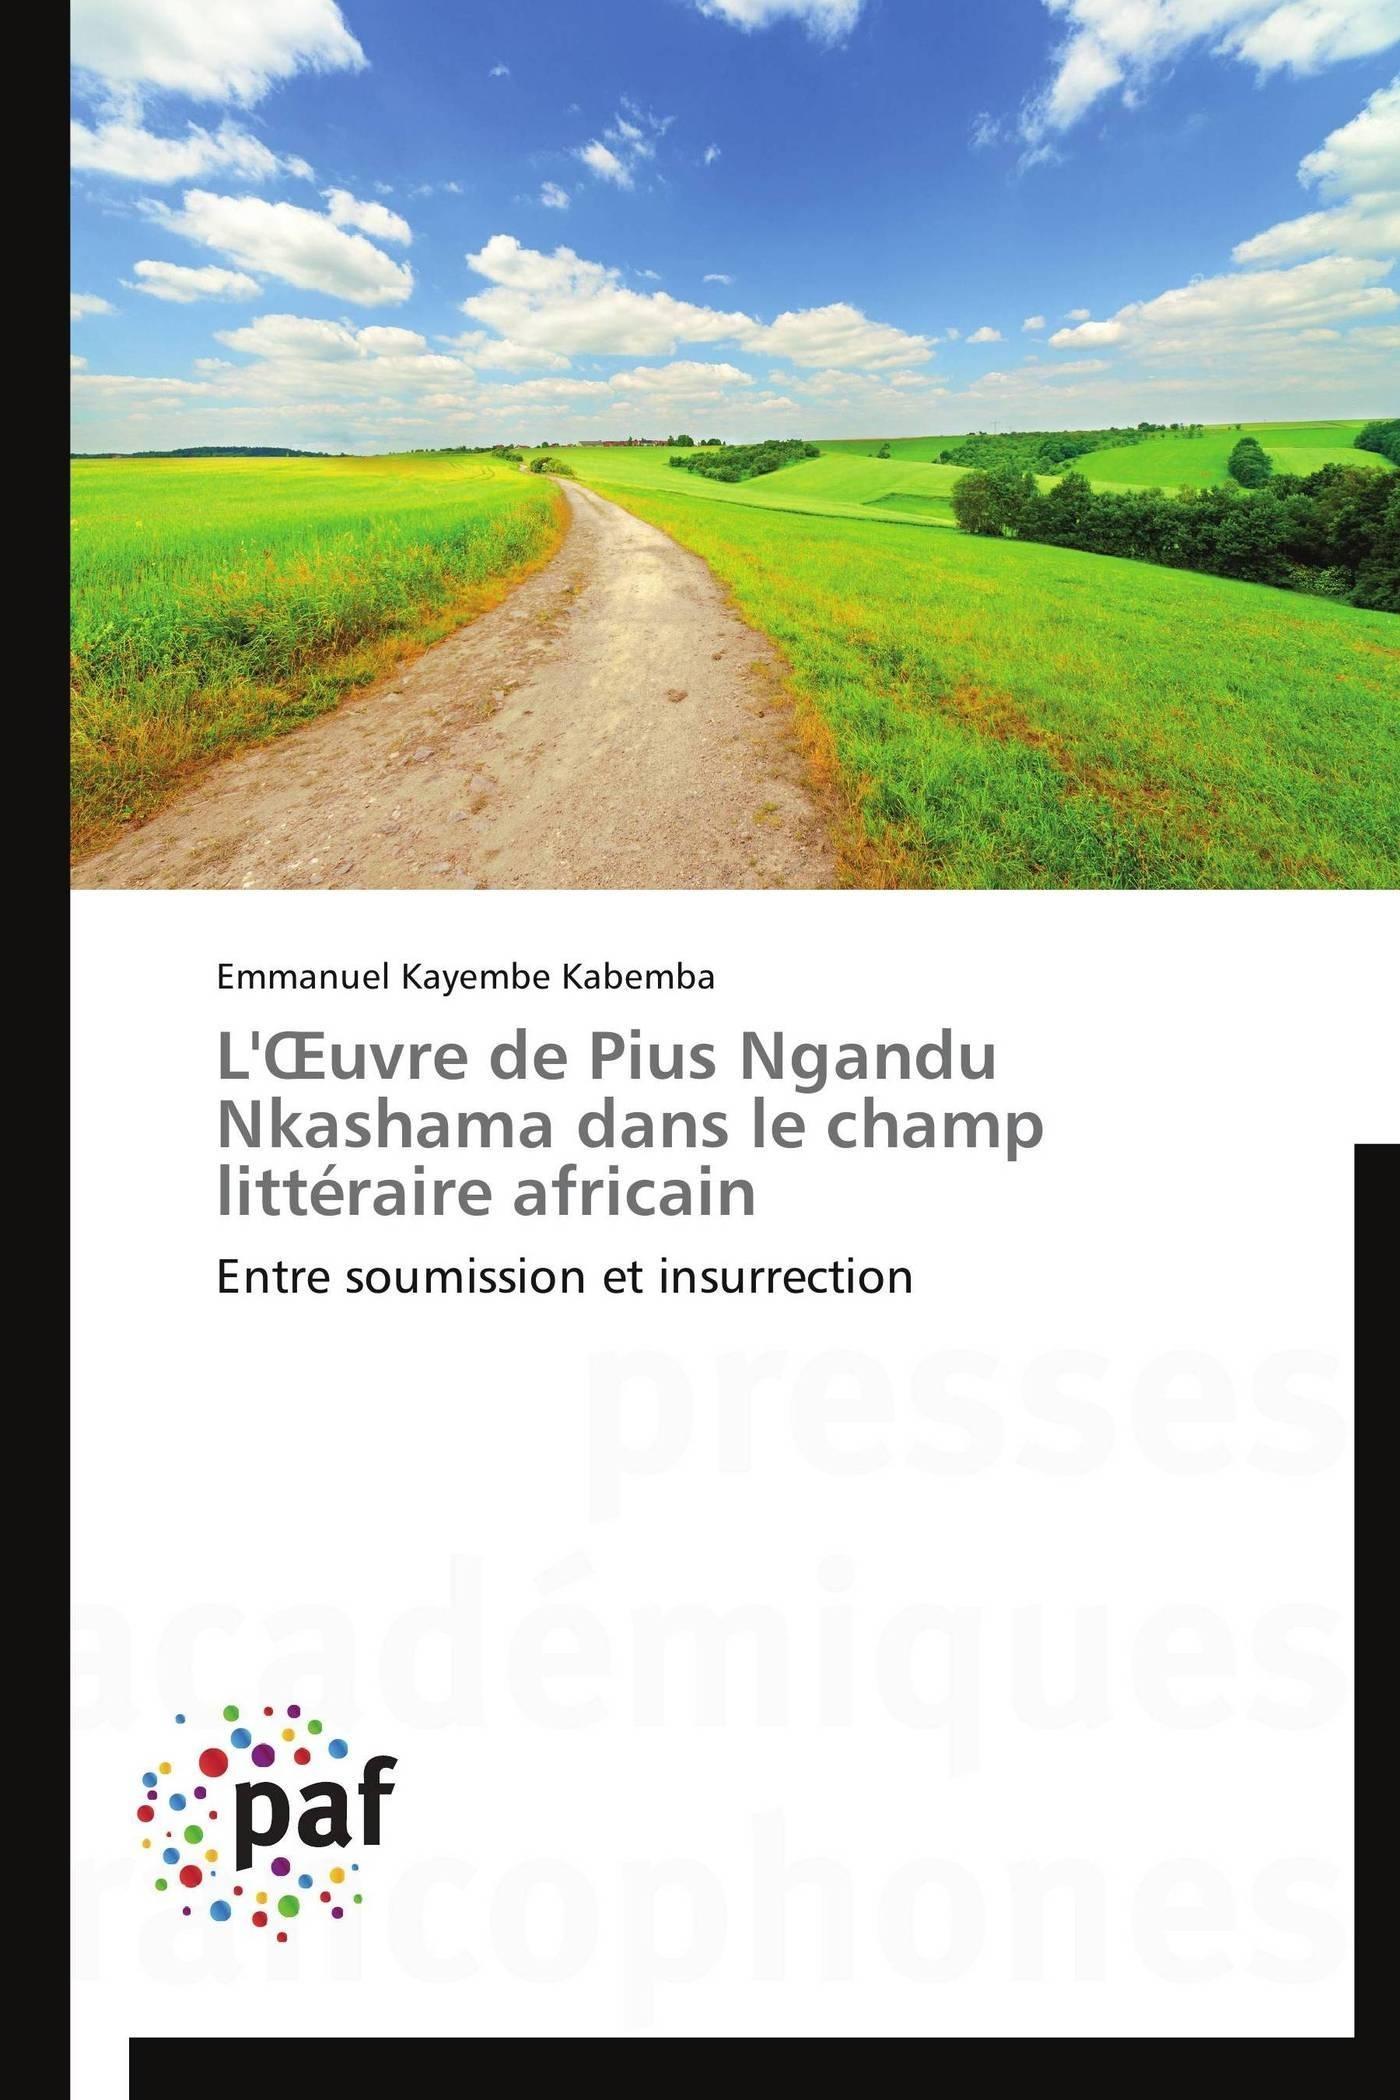 L'OEUVRE DE PIUS NGANDU NKASHAMA DANS LE CHAMP LITTERAIRE AFRICAIN